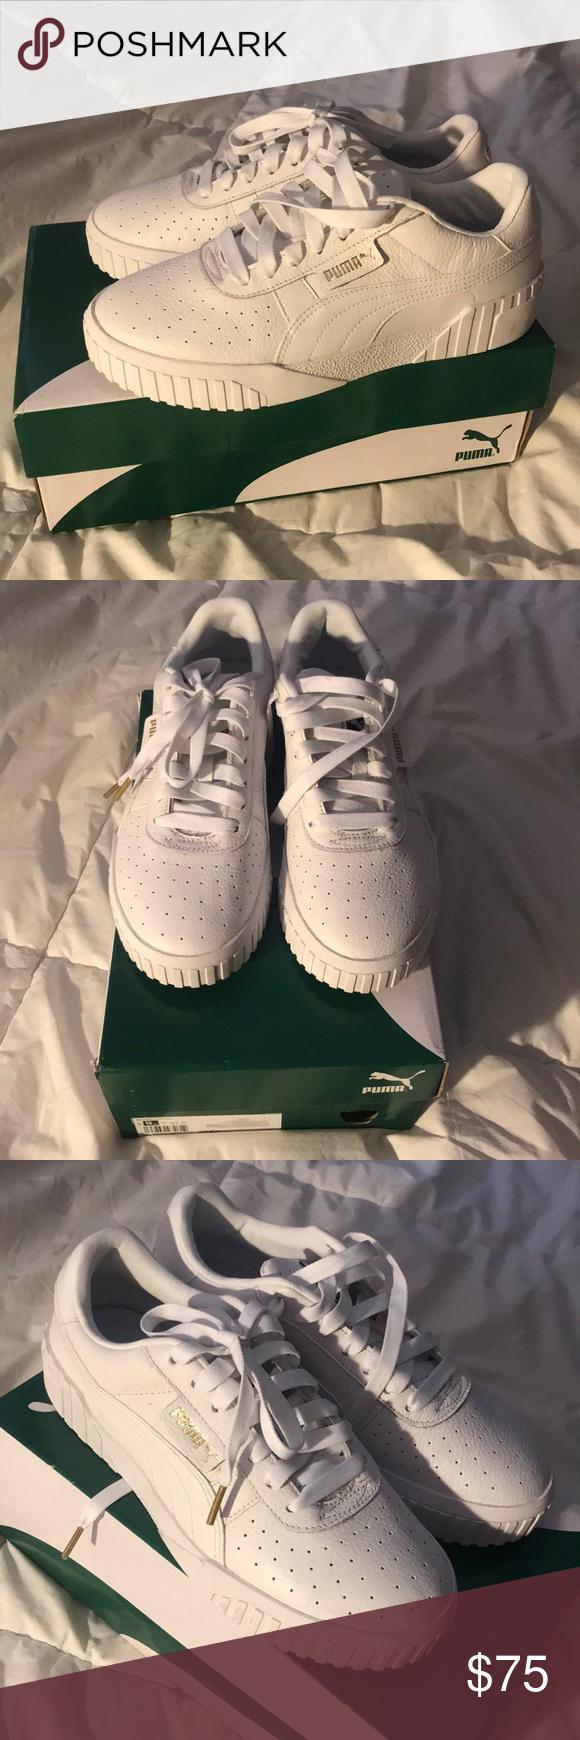 NEW- women's puma Cali white sneakers